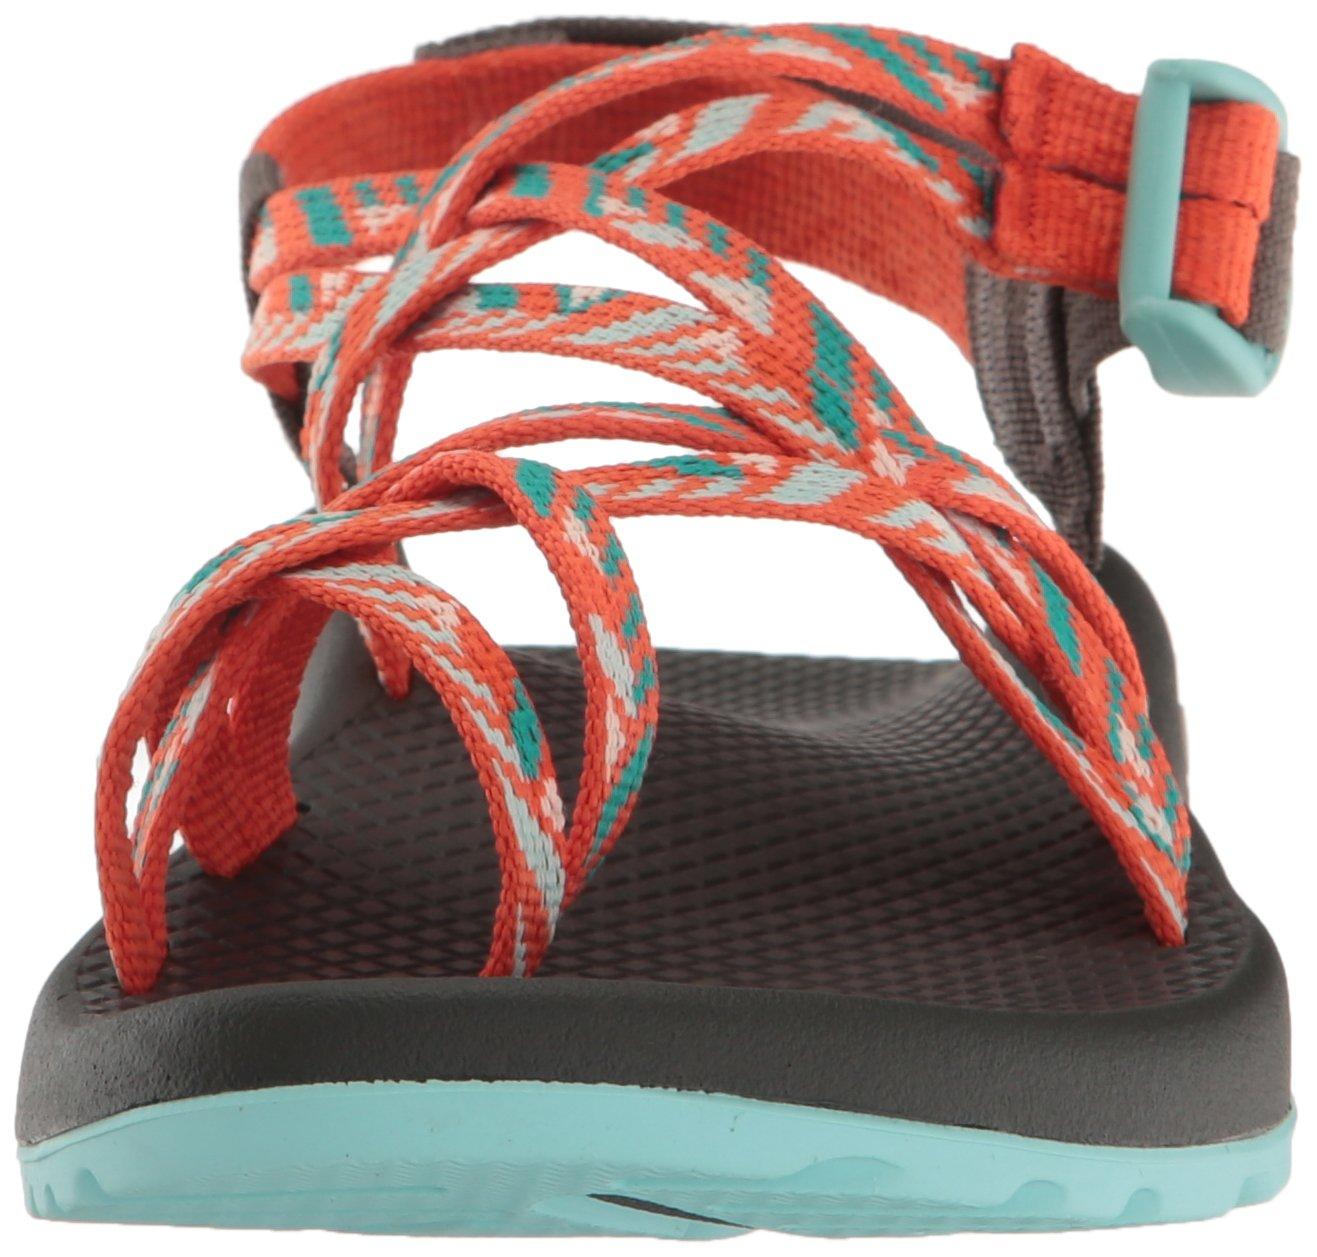 Chaco Women's Zx2 Classic Athletic Sandal B01H4XFD7K 9 B(M) US|Tunnel Tango